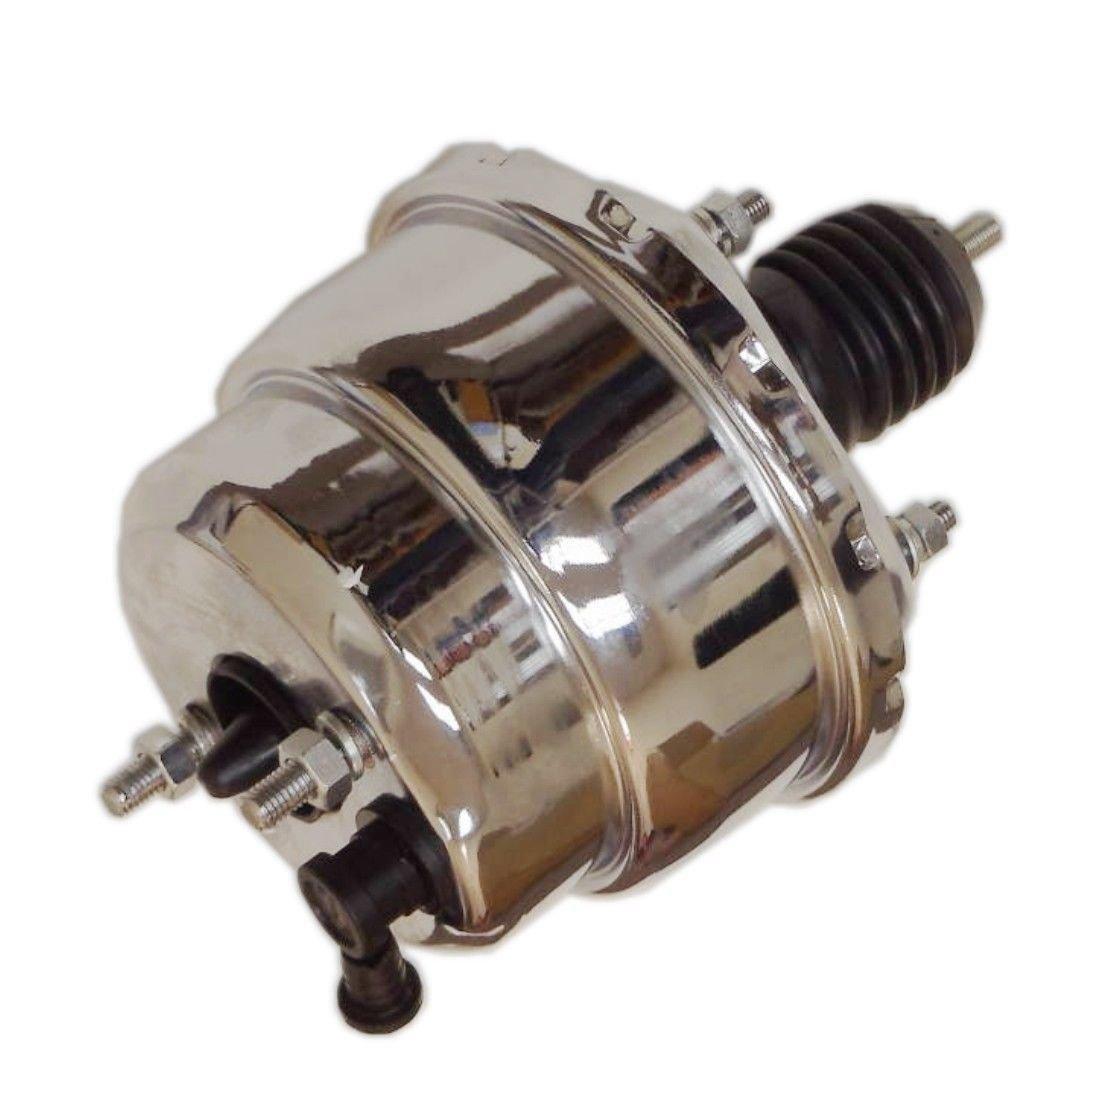 7 Dual Diaphragm chrome Brake Booster Hot Rod Street